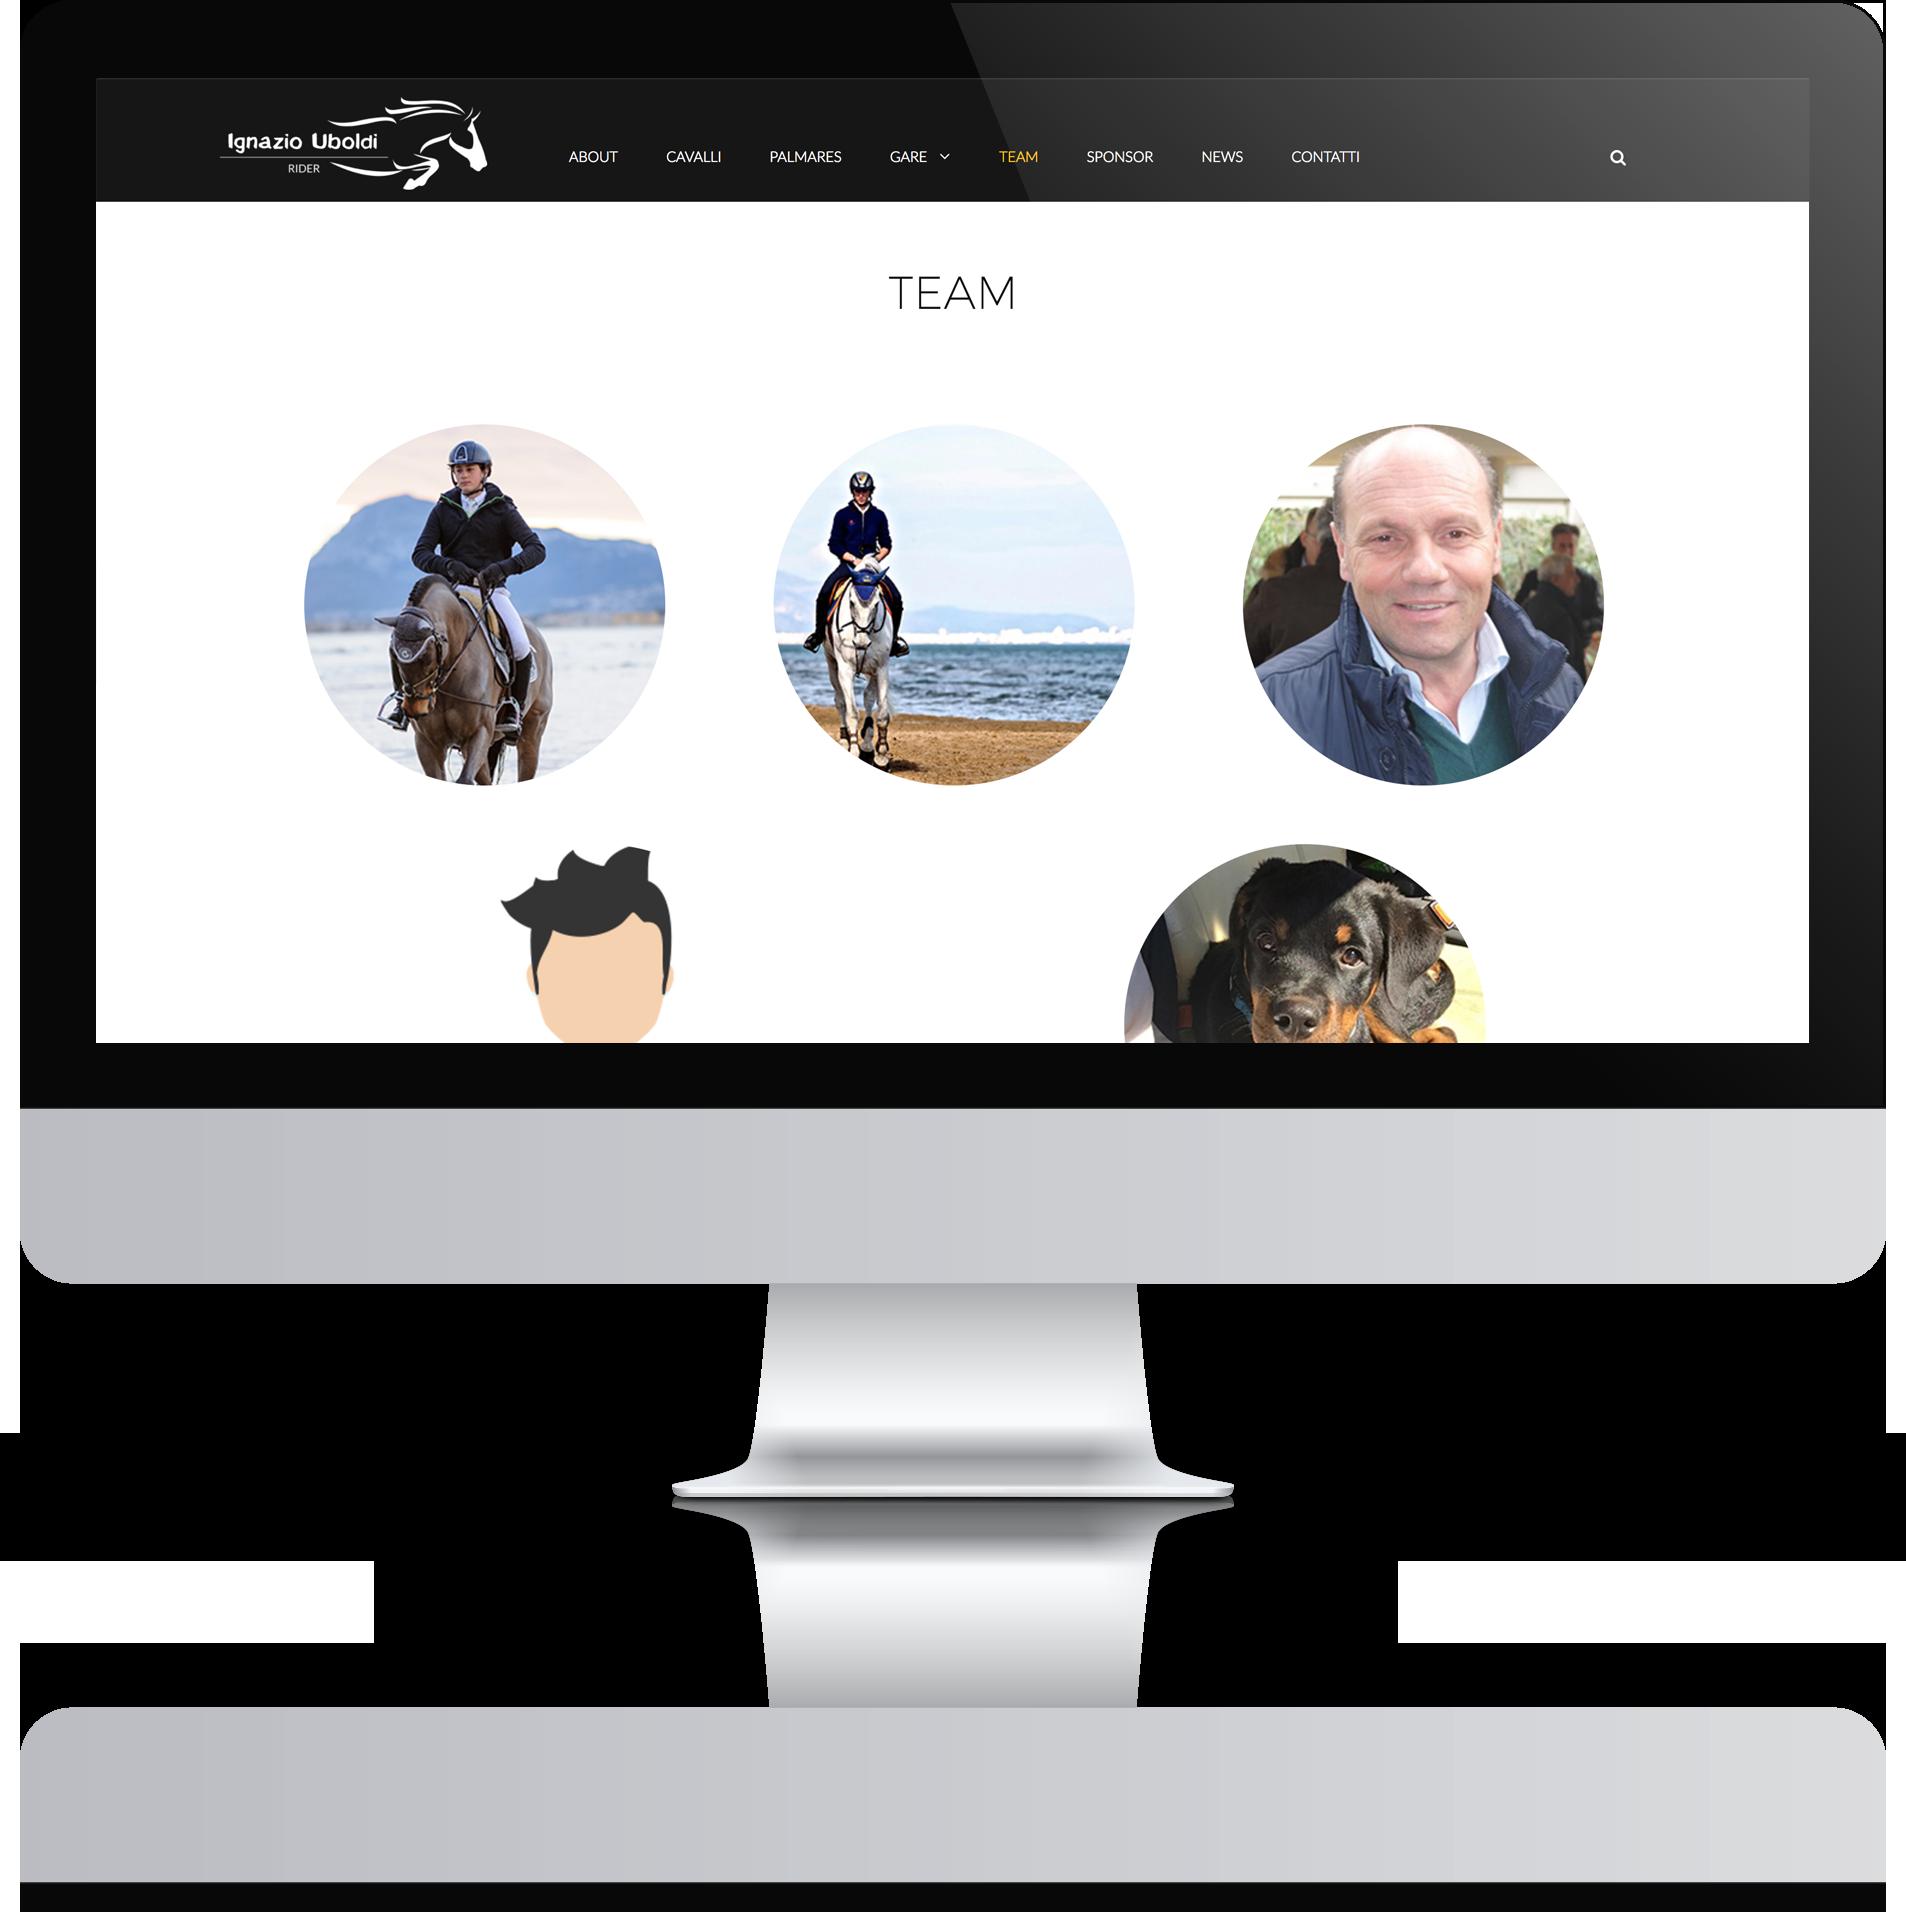 mockup tablet sviluppo sito web responsivo ignazio uboldi